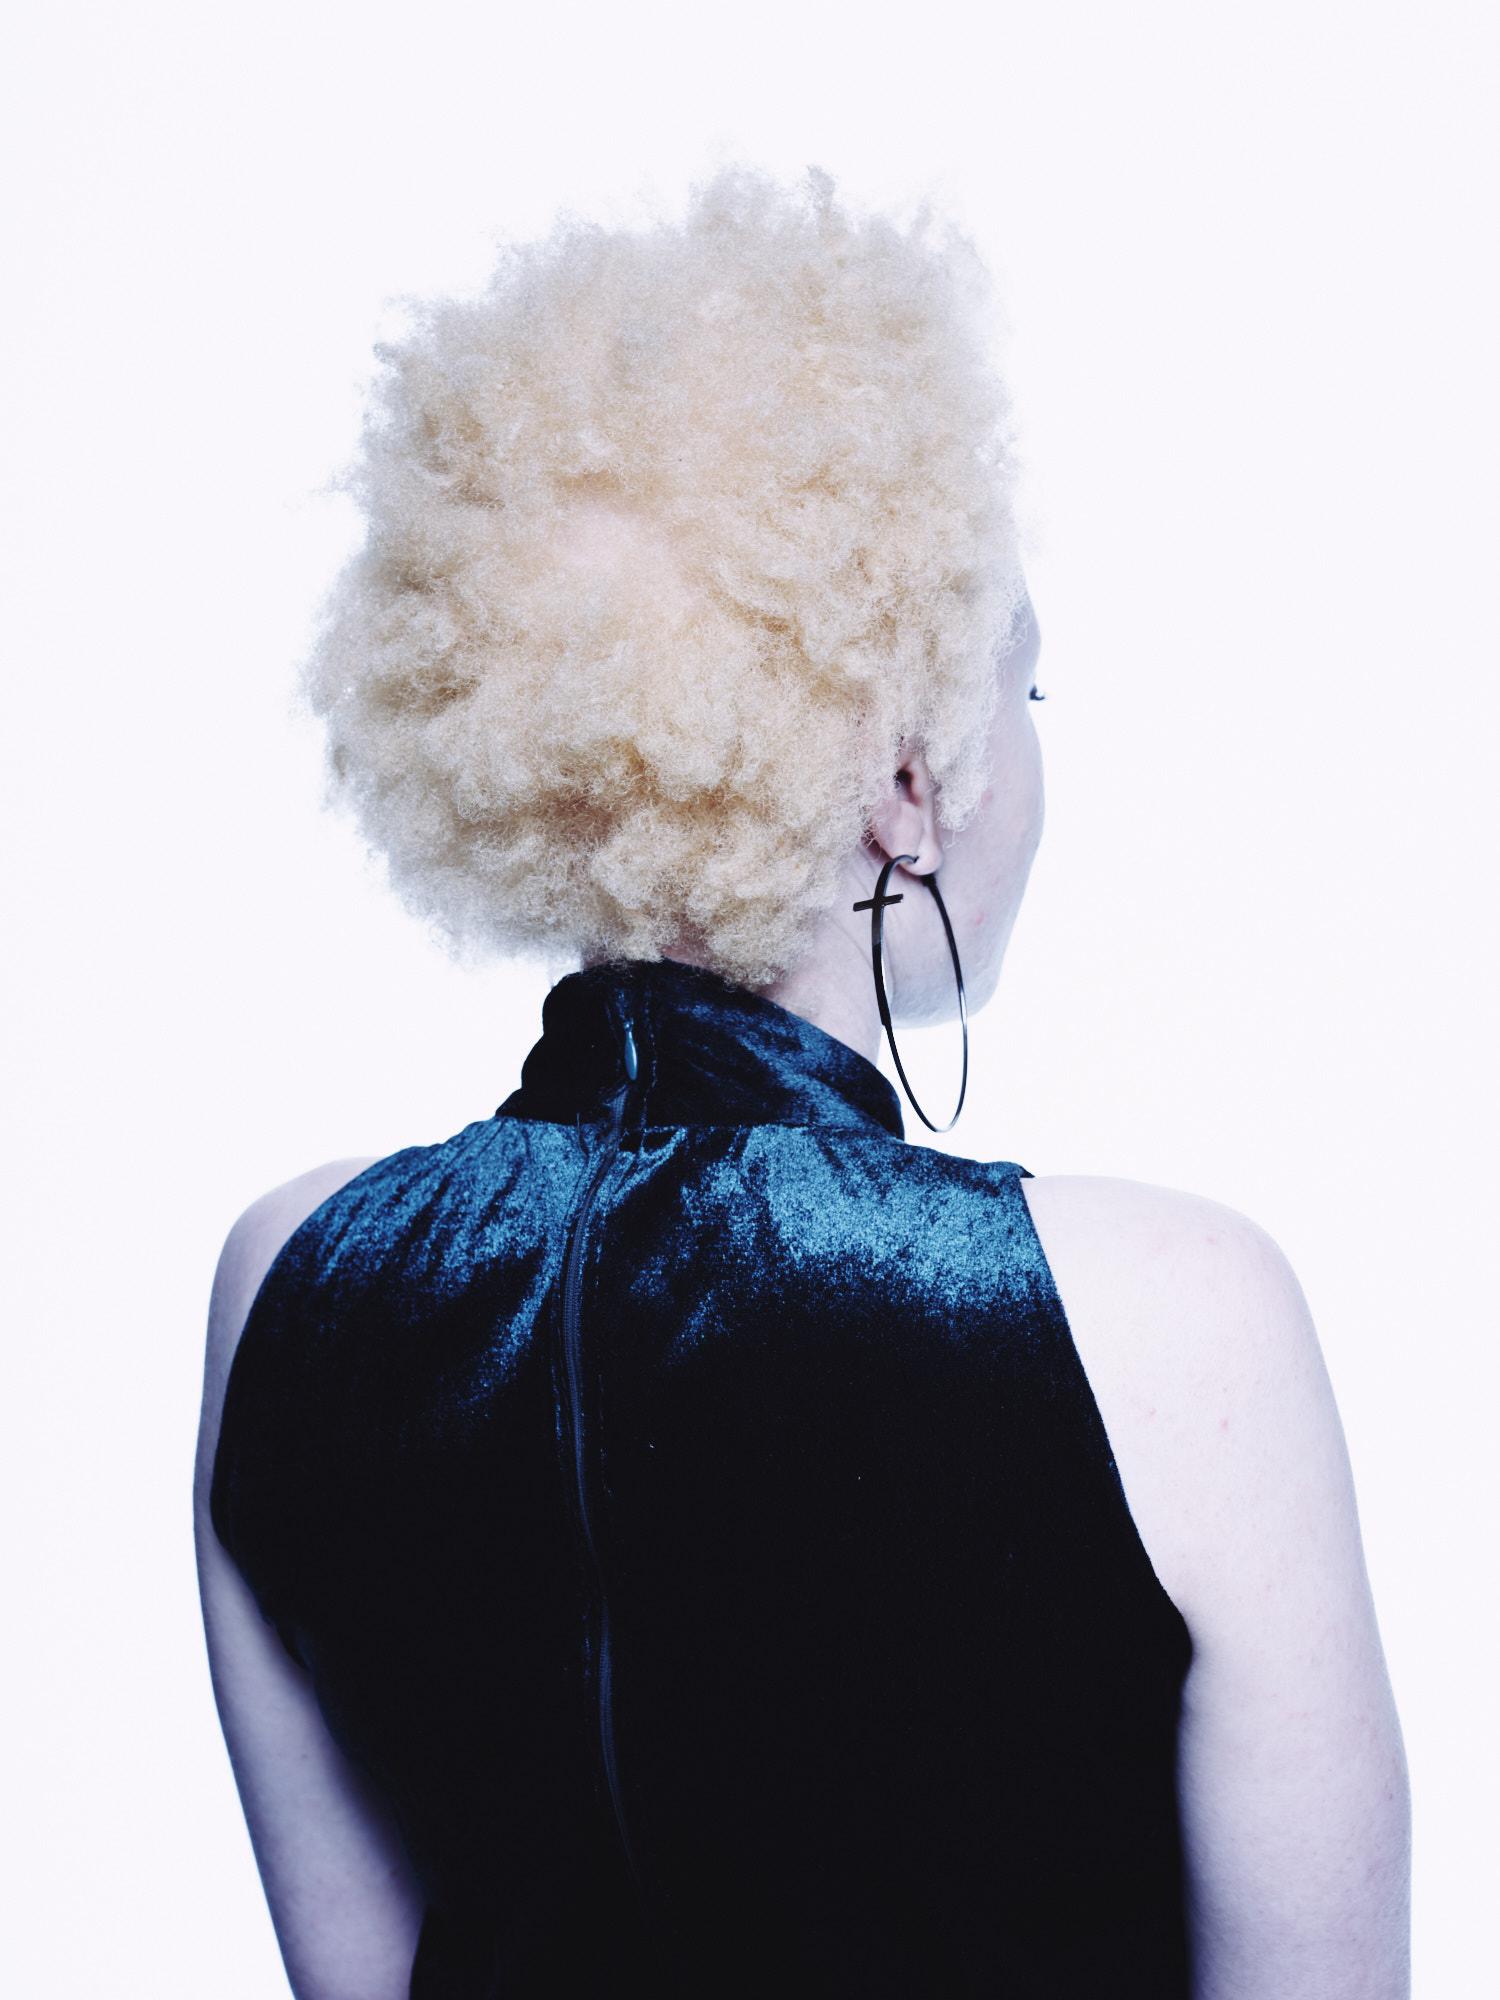 Khulisa_albinism_2018_12_04_Shot_01_0337